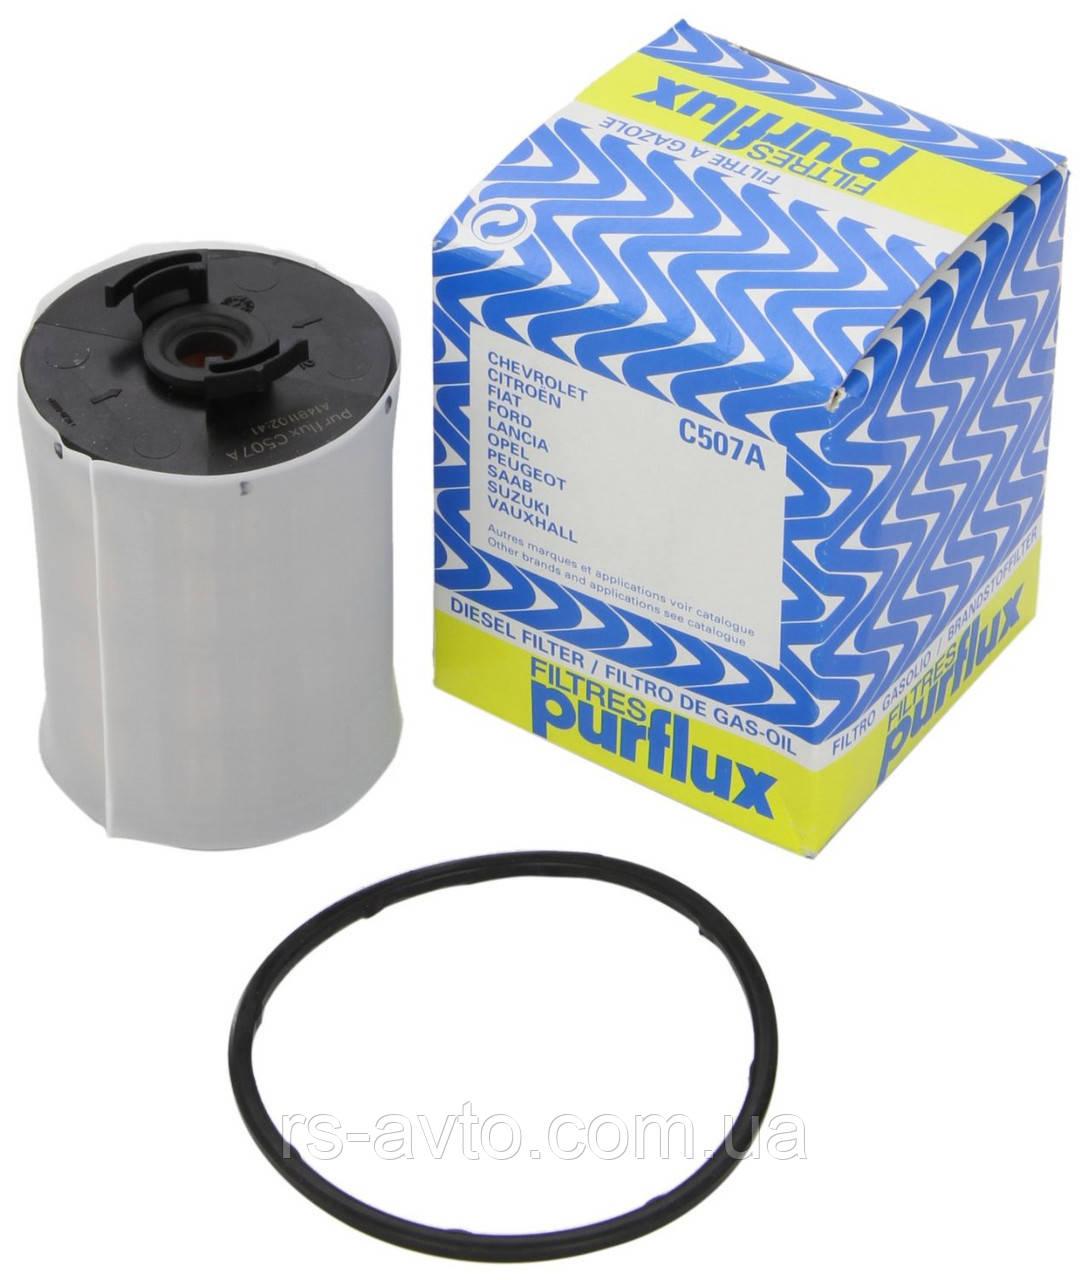 Топливный фильтр  PURFLUX C507 Fiat Ducato\Citroen Jumper Peugeot Boxer/2.2/2.3/3.0-MJTD/HDI-2006> Франция